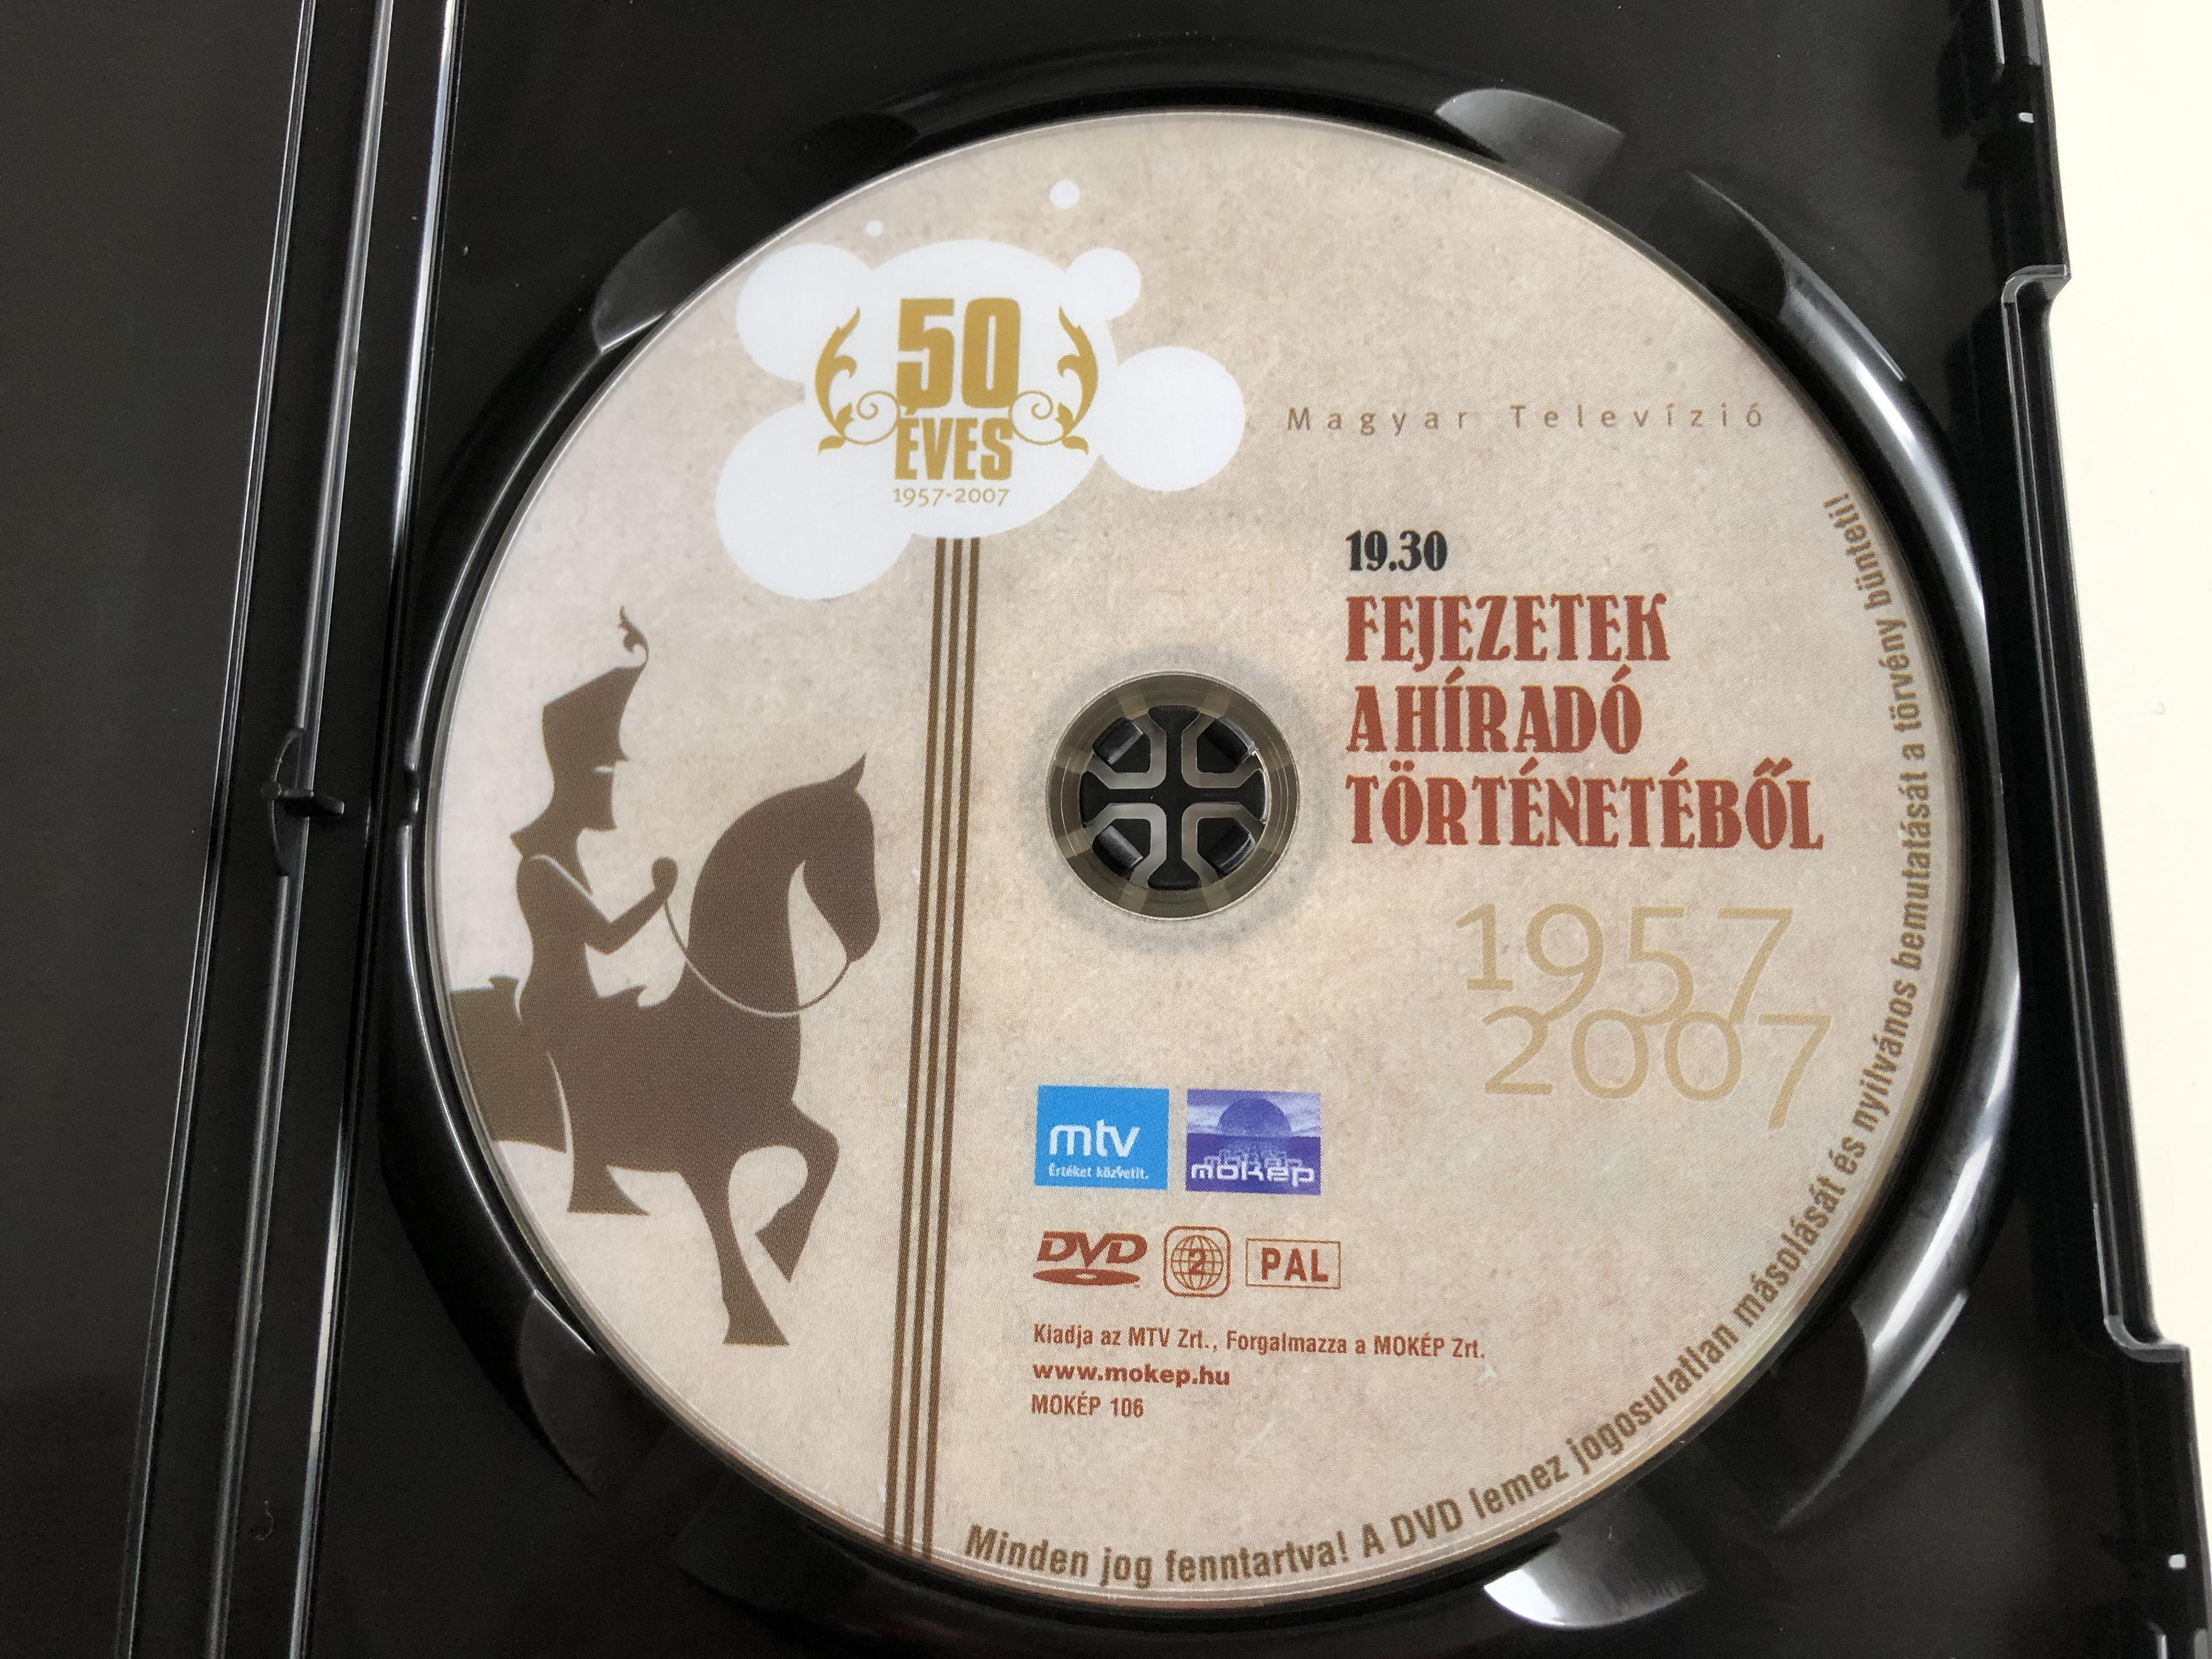 magyar-telev-zi-19.30-fejezetek-a-h-rad-t-rt-net-b-l-dvd-2.jpg